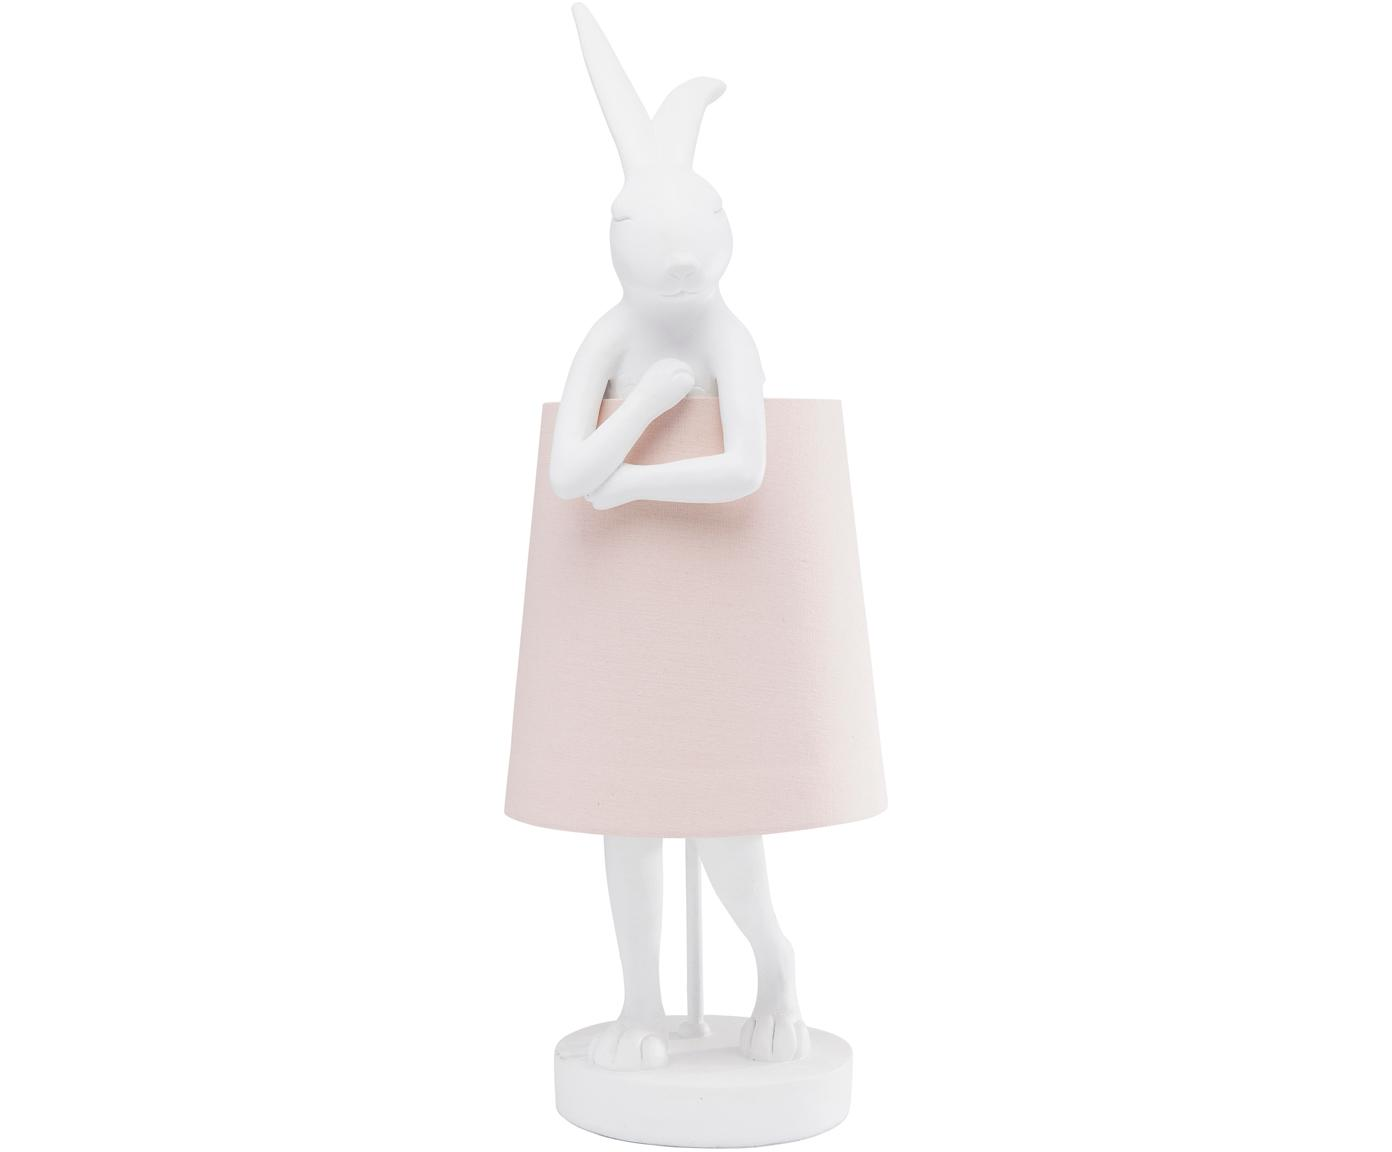 Grote Tafellamp Rabbit, Lampenkap: linnen, Frame: polyresin, Stang: gepoedercoat staal, Wit, roze, Ø 23 x H 68 cm